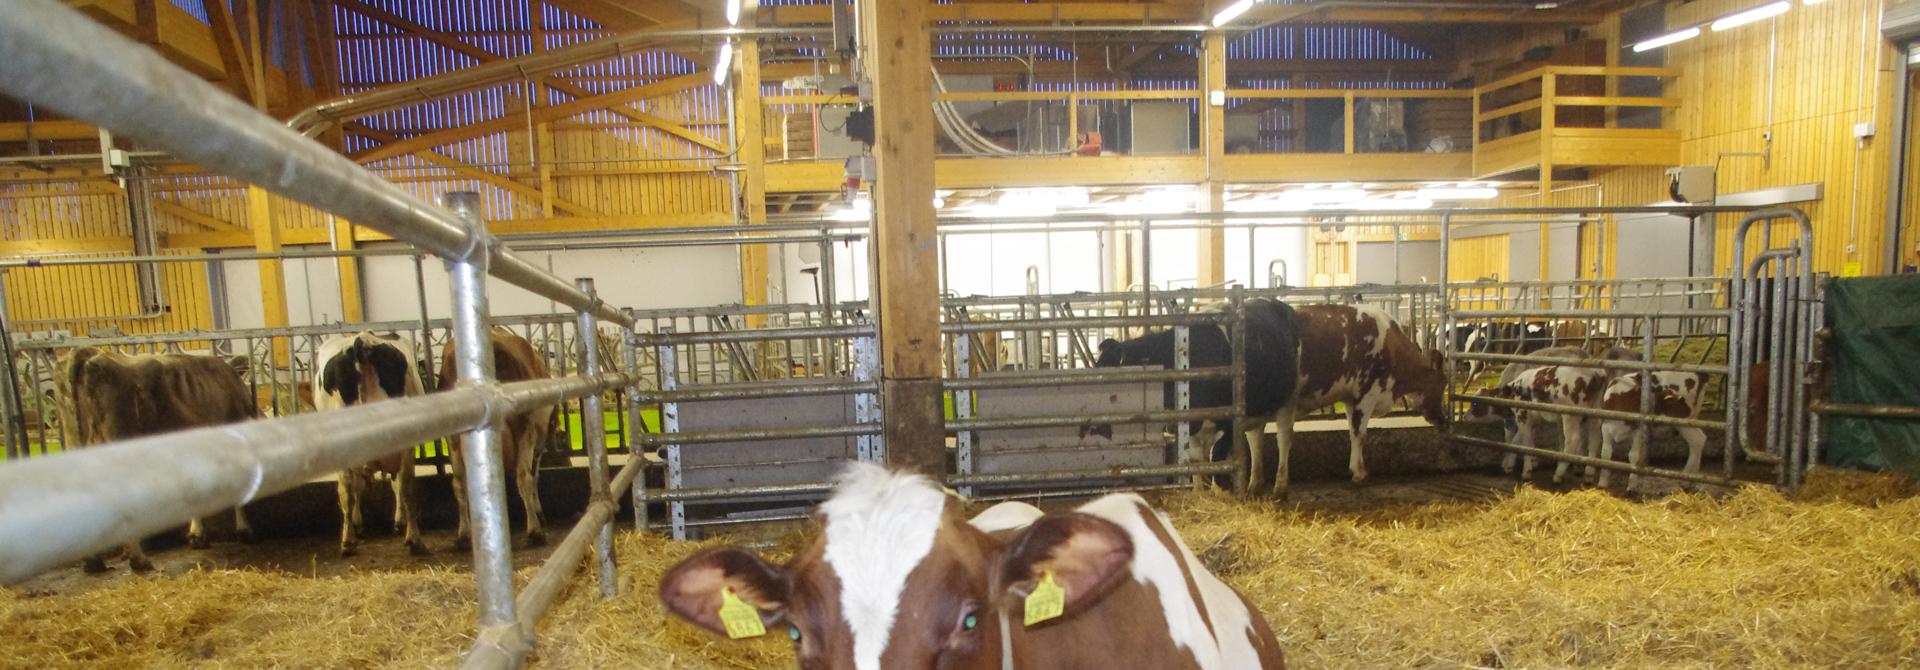 Kuh in der Abkalbebox im Stall>